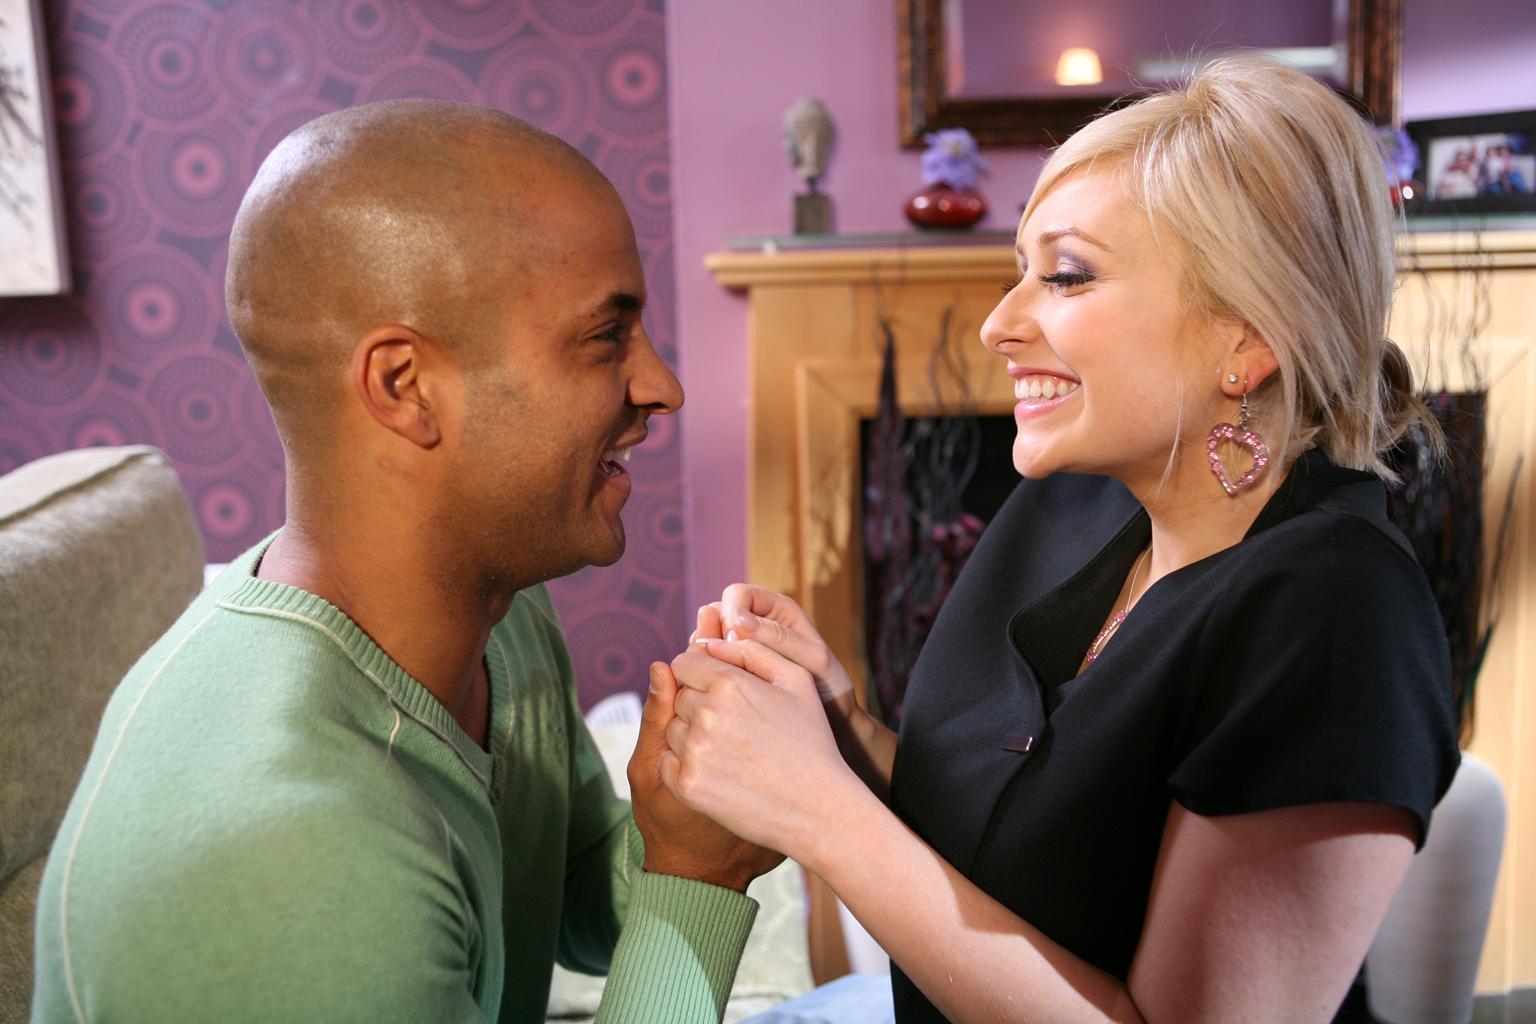 Carmel has a proposal for Calvin